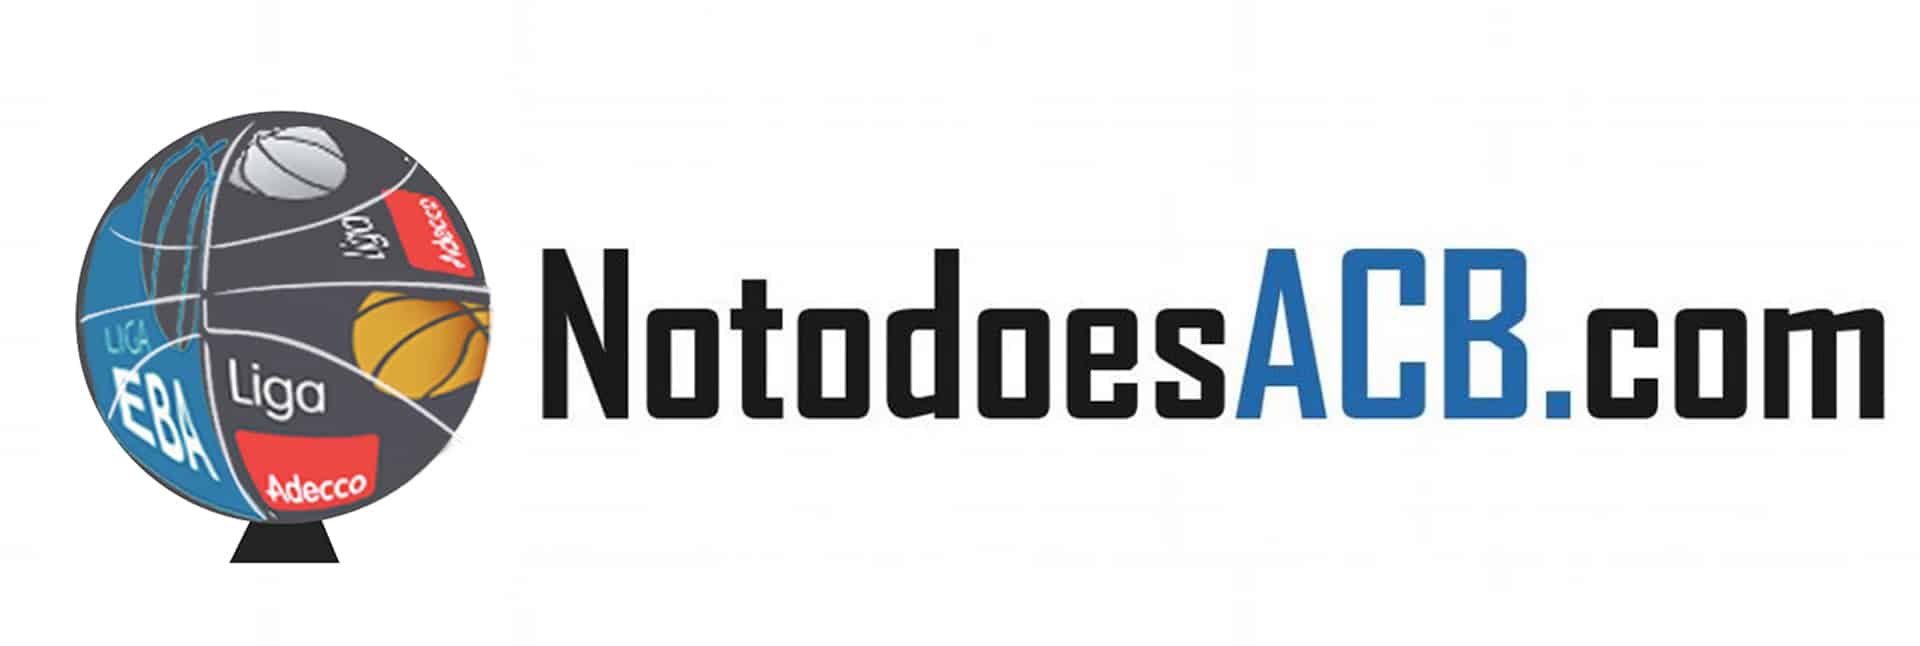 notodoesacb-logo-1920